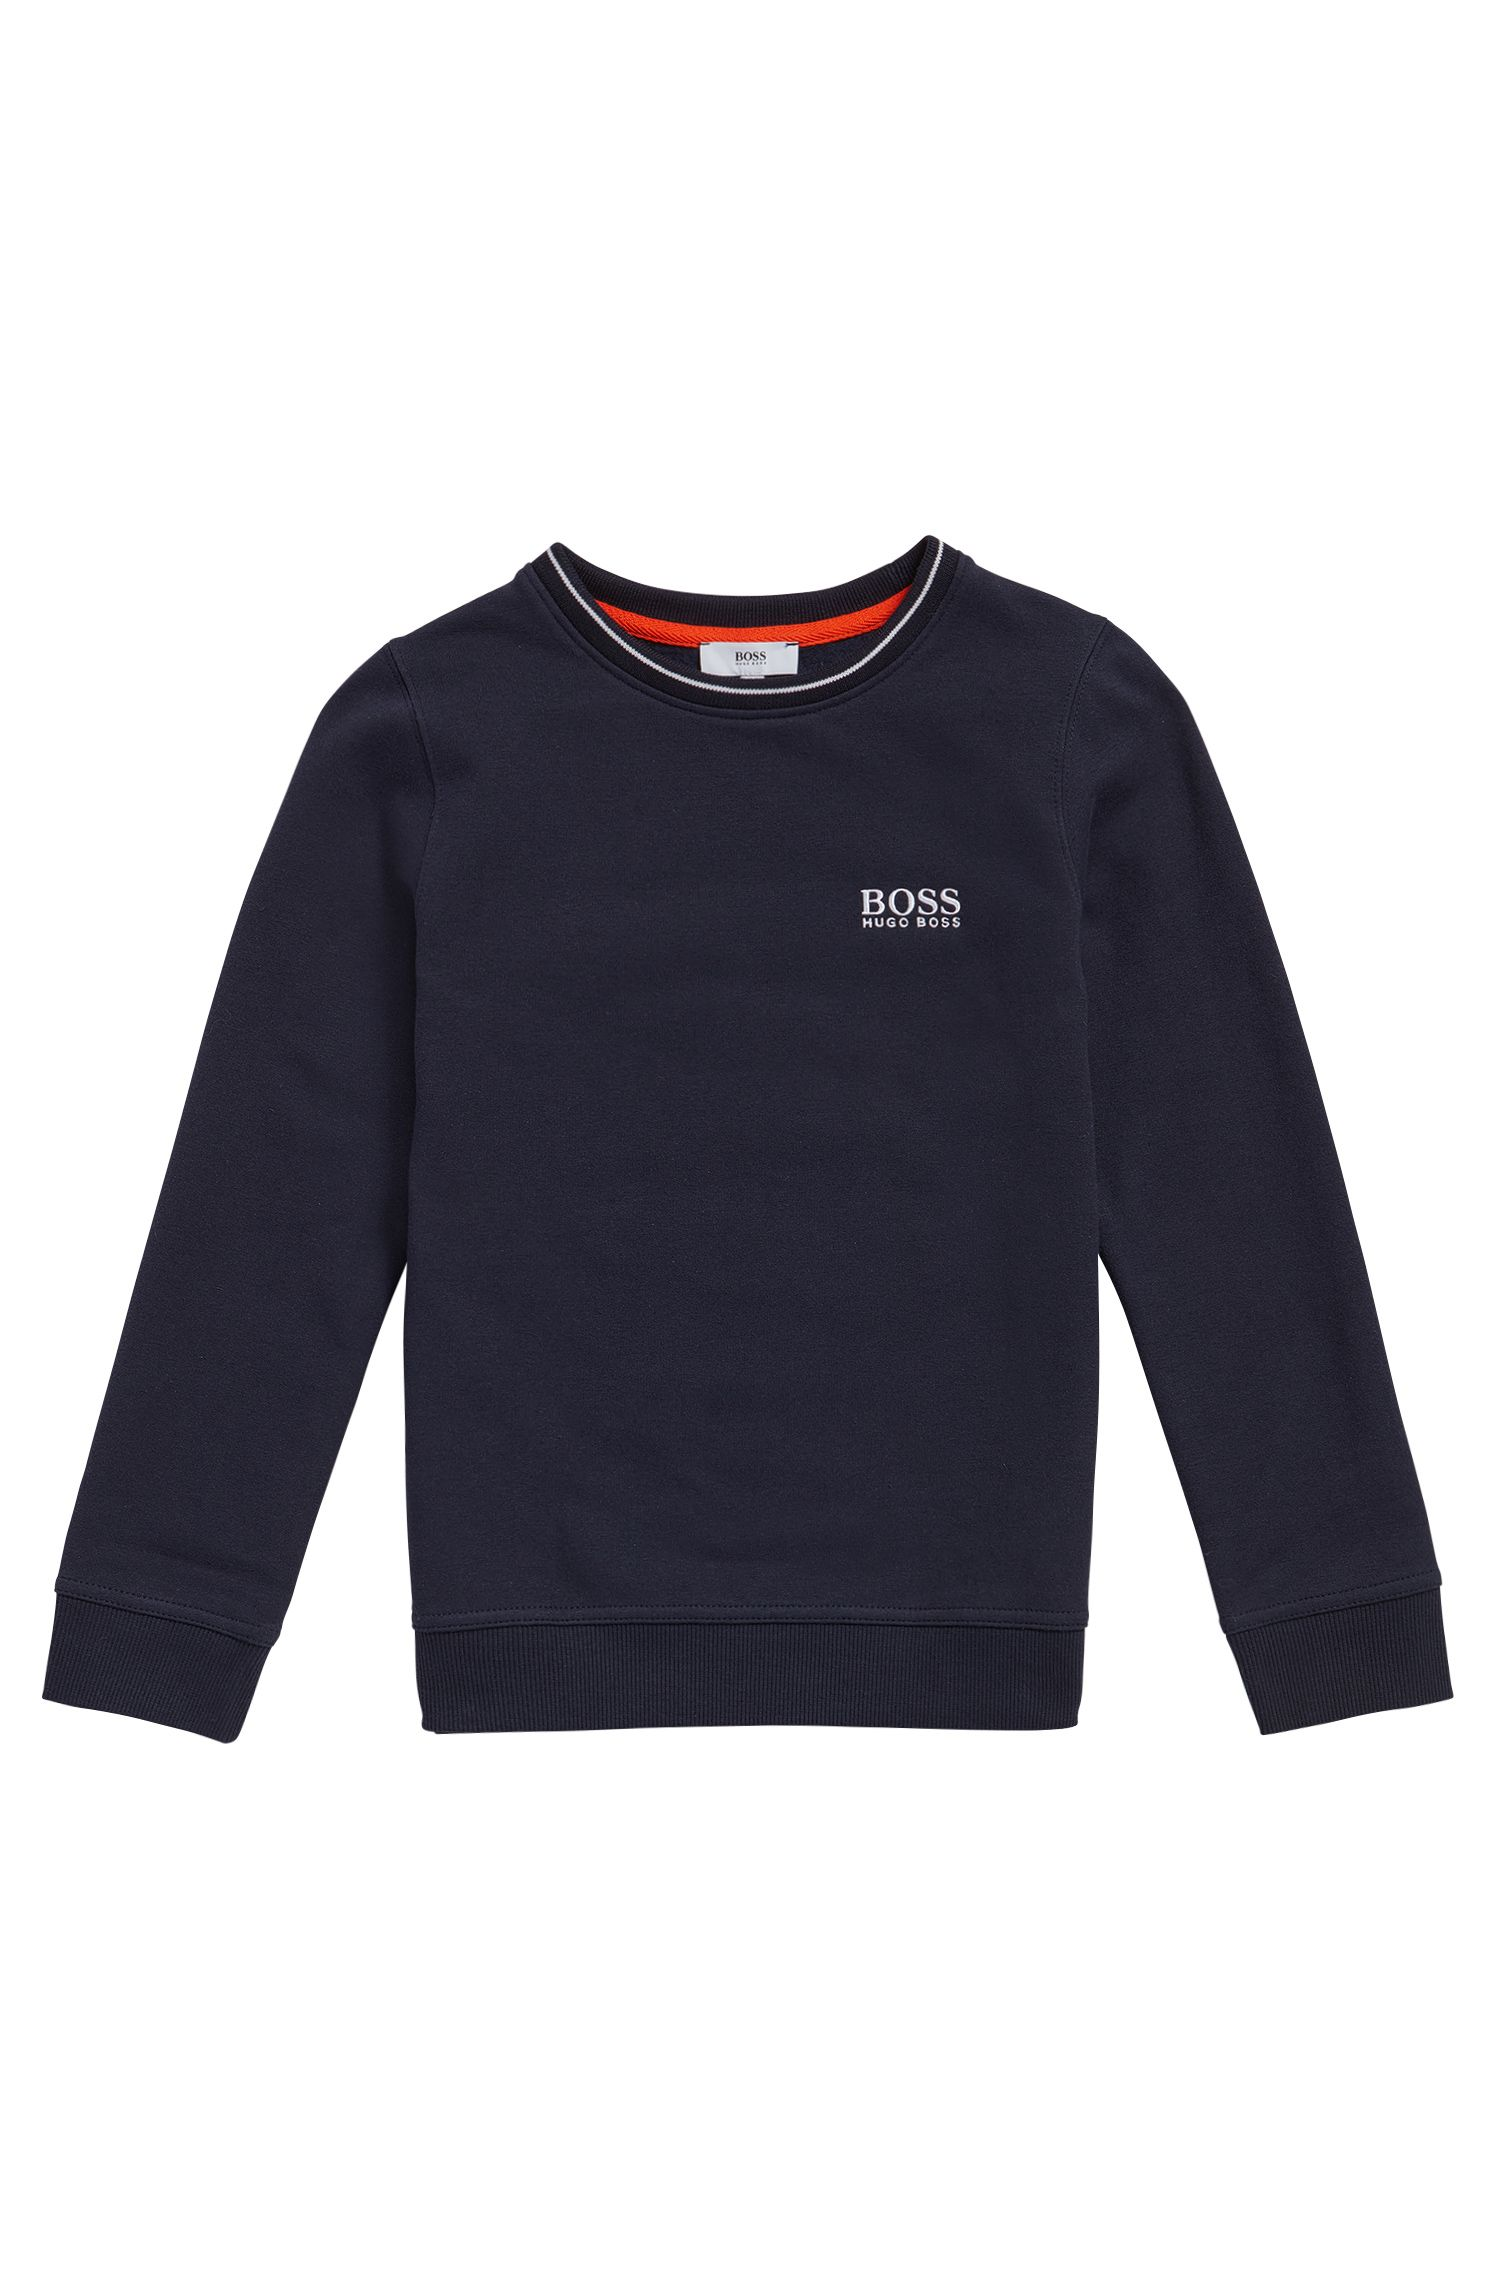 Kids' cotton sweatshirt with embroidered logo: 'J25985'